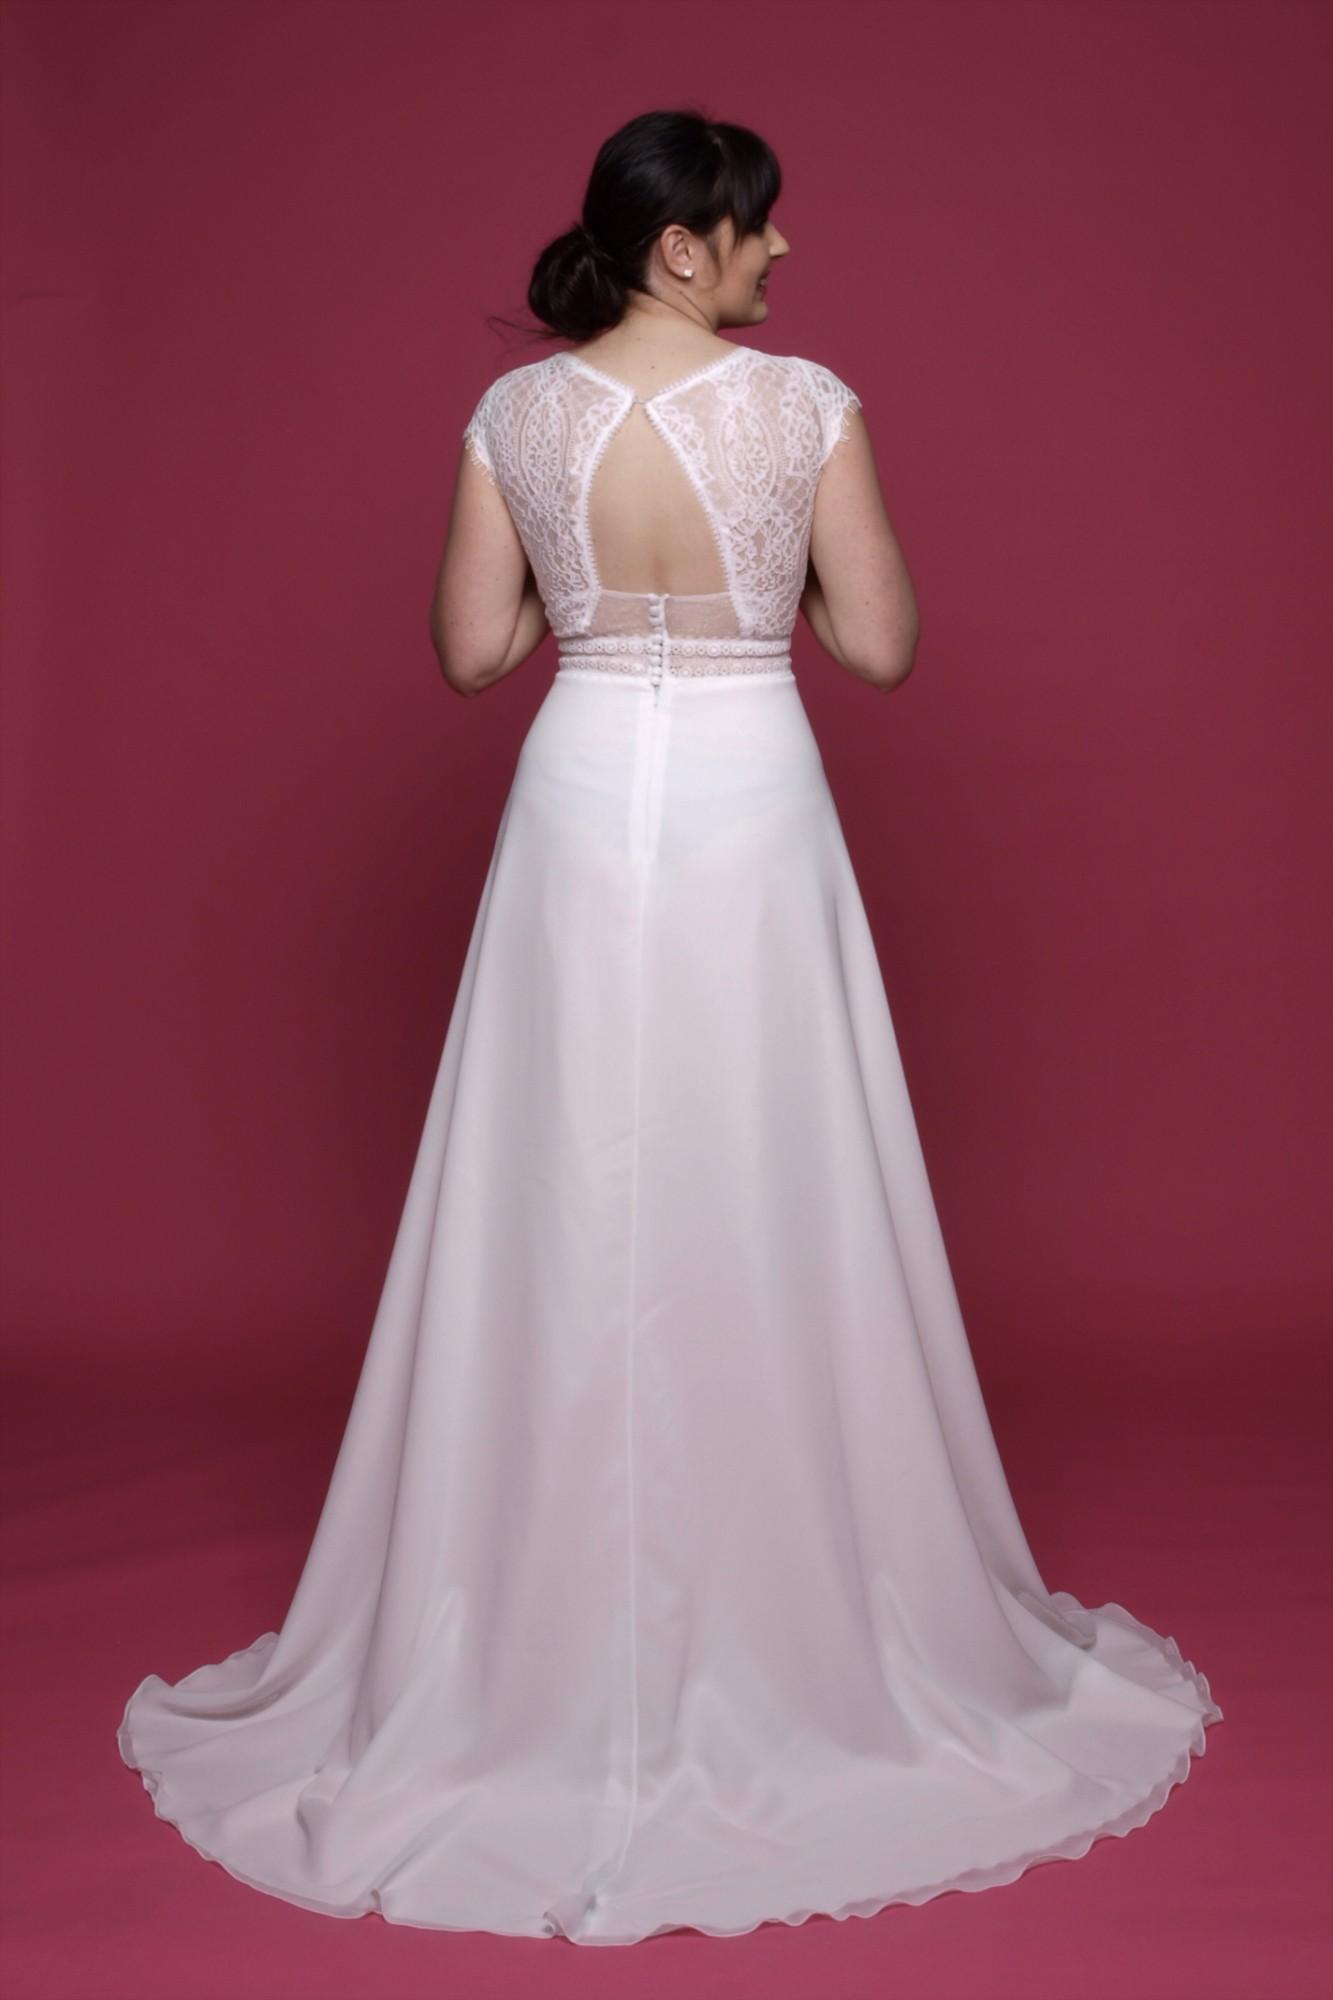 Robe de Coeur - Robe de mariée - Albi - Tarn - robe neuve - petit budget - bianco évento